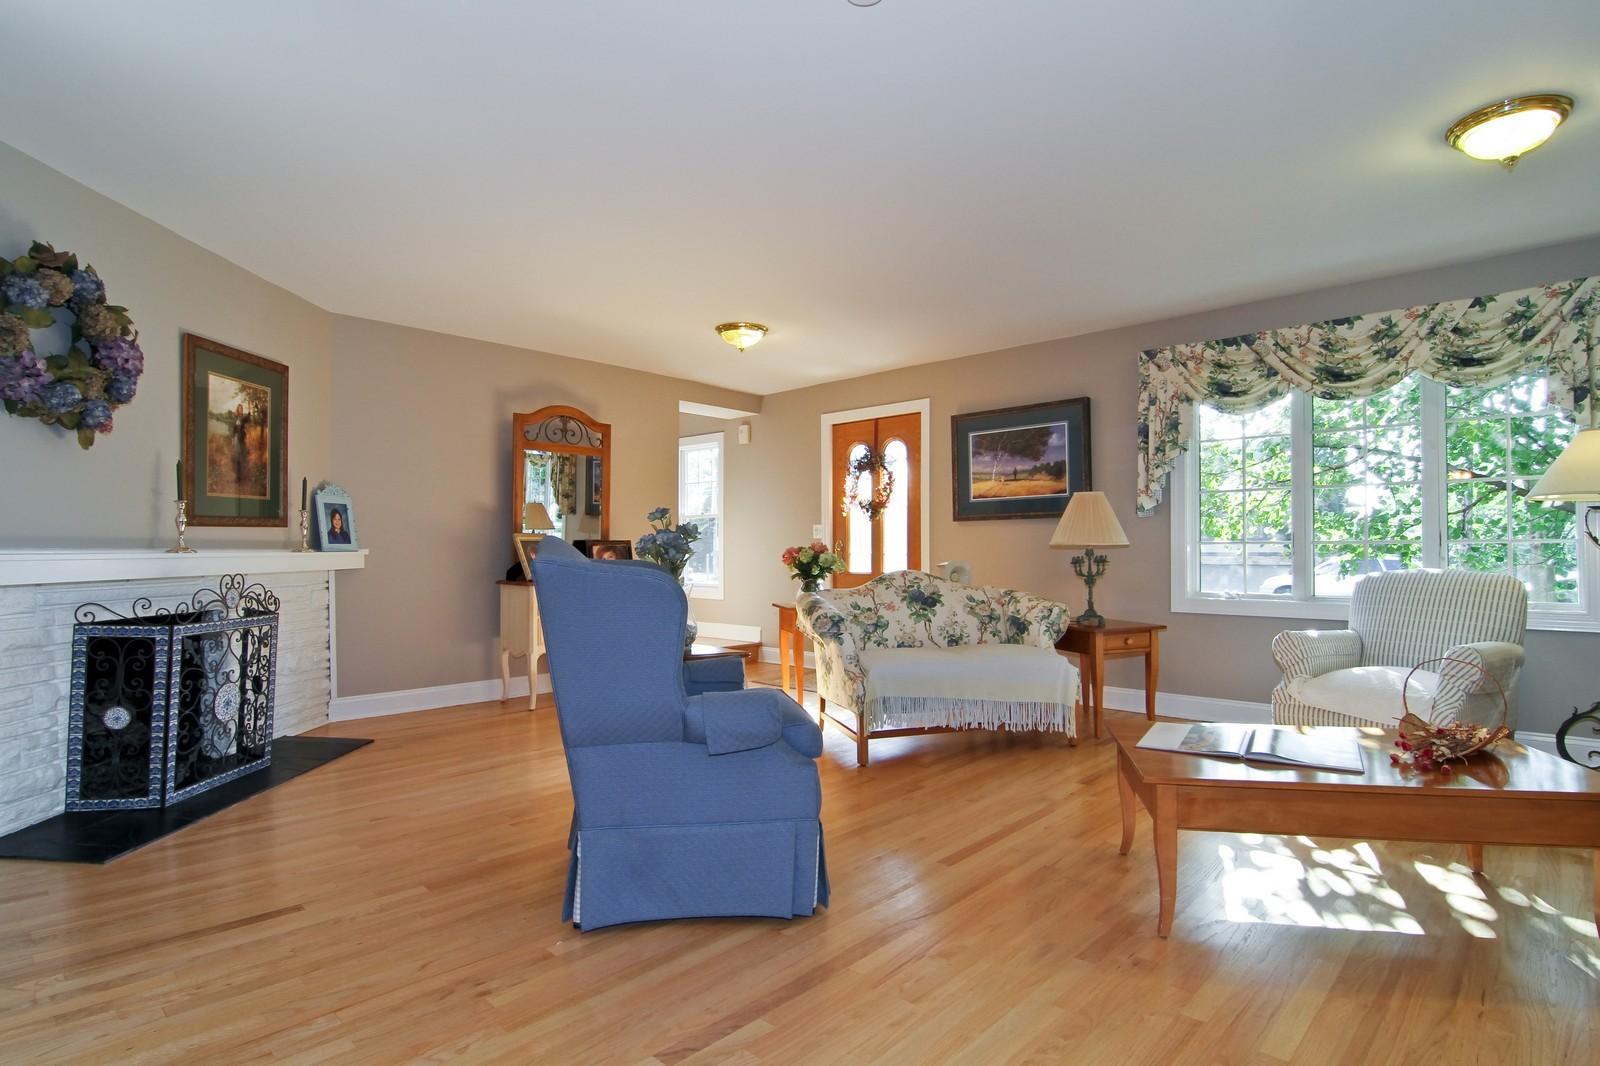 Real Estate Photography - 441 Edgewood Dr, La Grange, IL, 60525 - Living Room